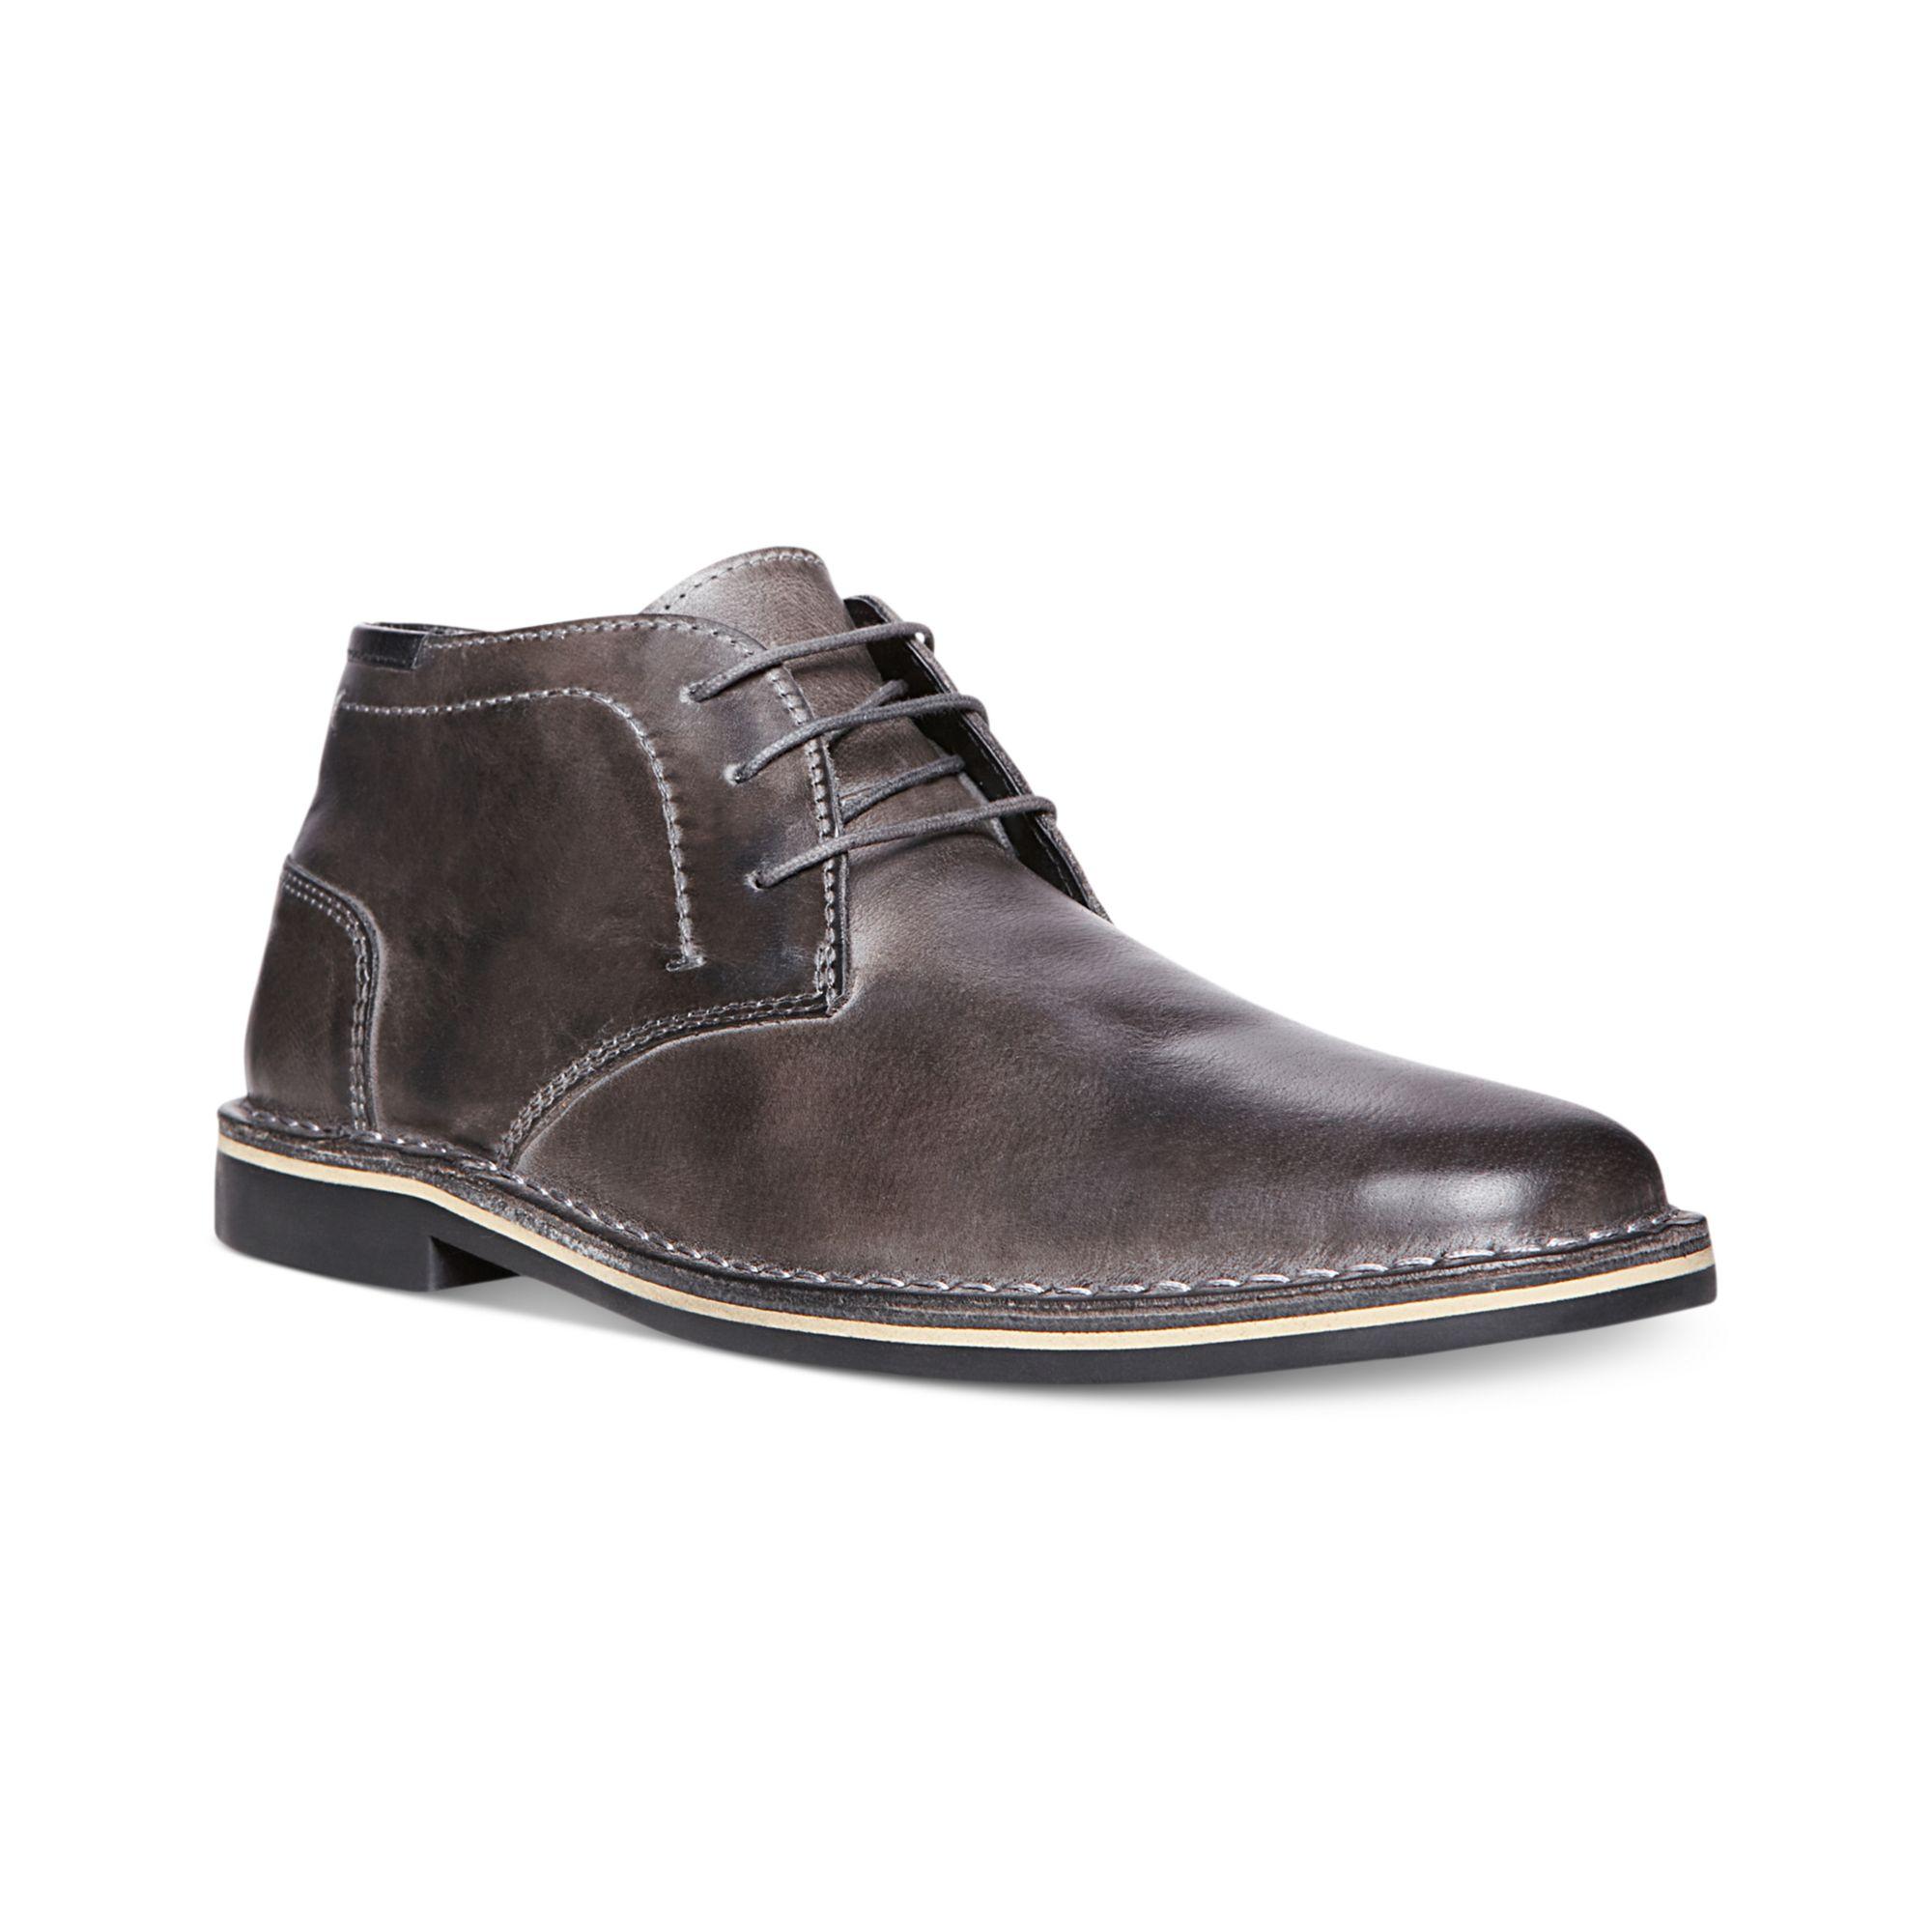 steve madden harken chukka boots in gray for grey lyst